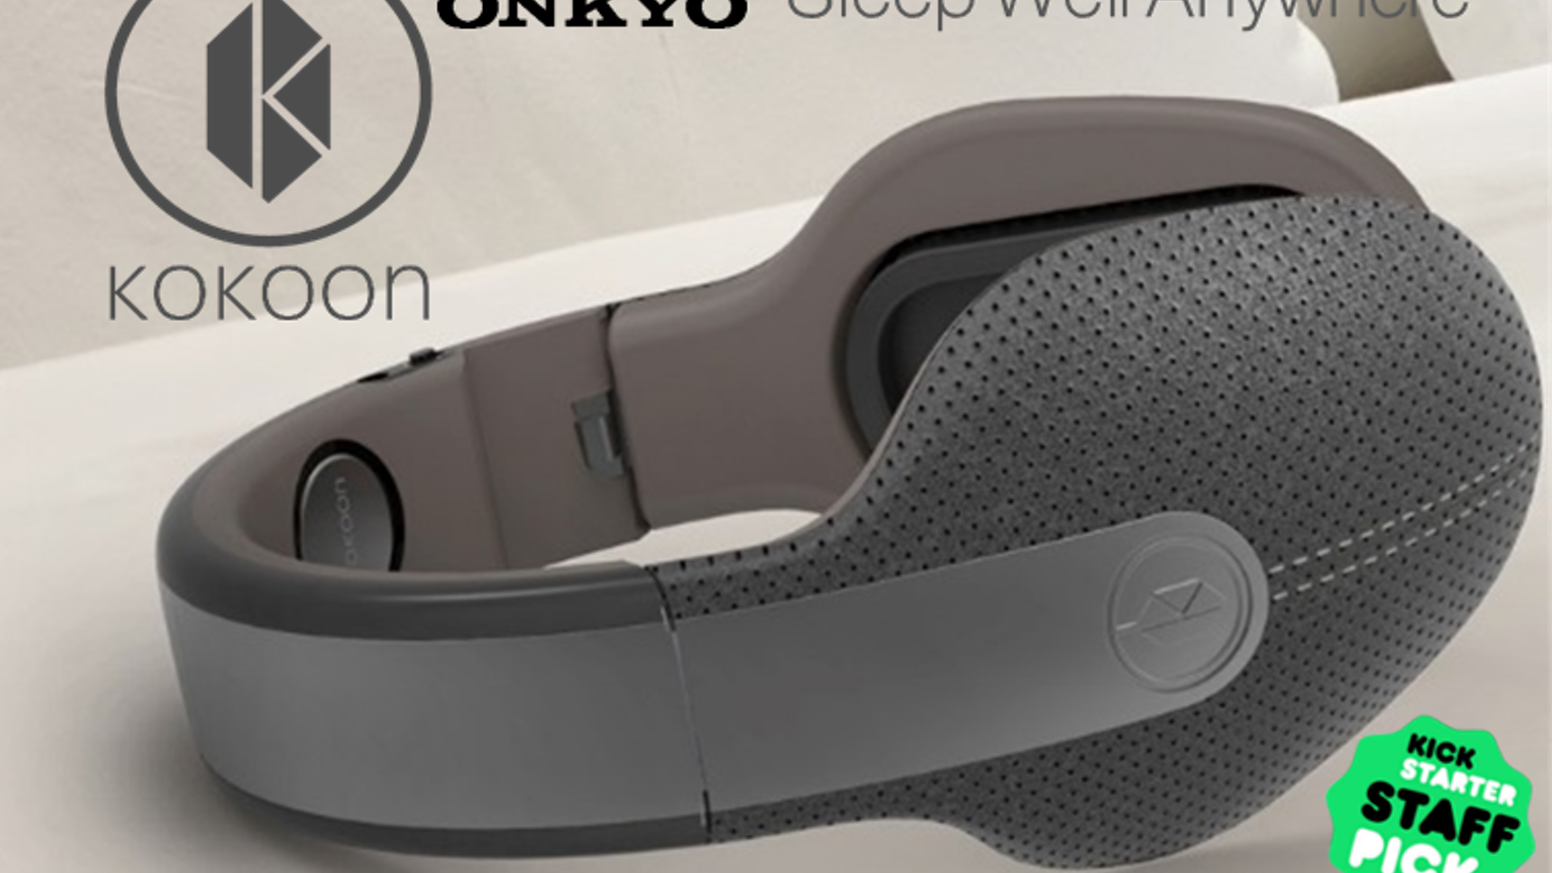 The ultimate sleep sanctuary: Kokoon EEG headphones by Tim » Kokoon